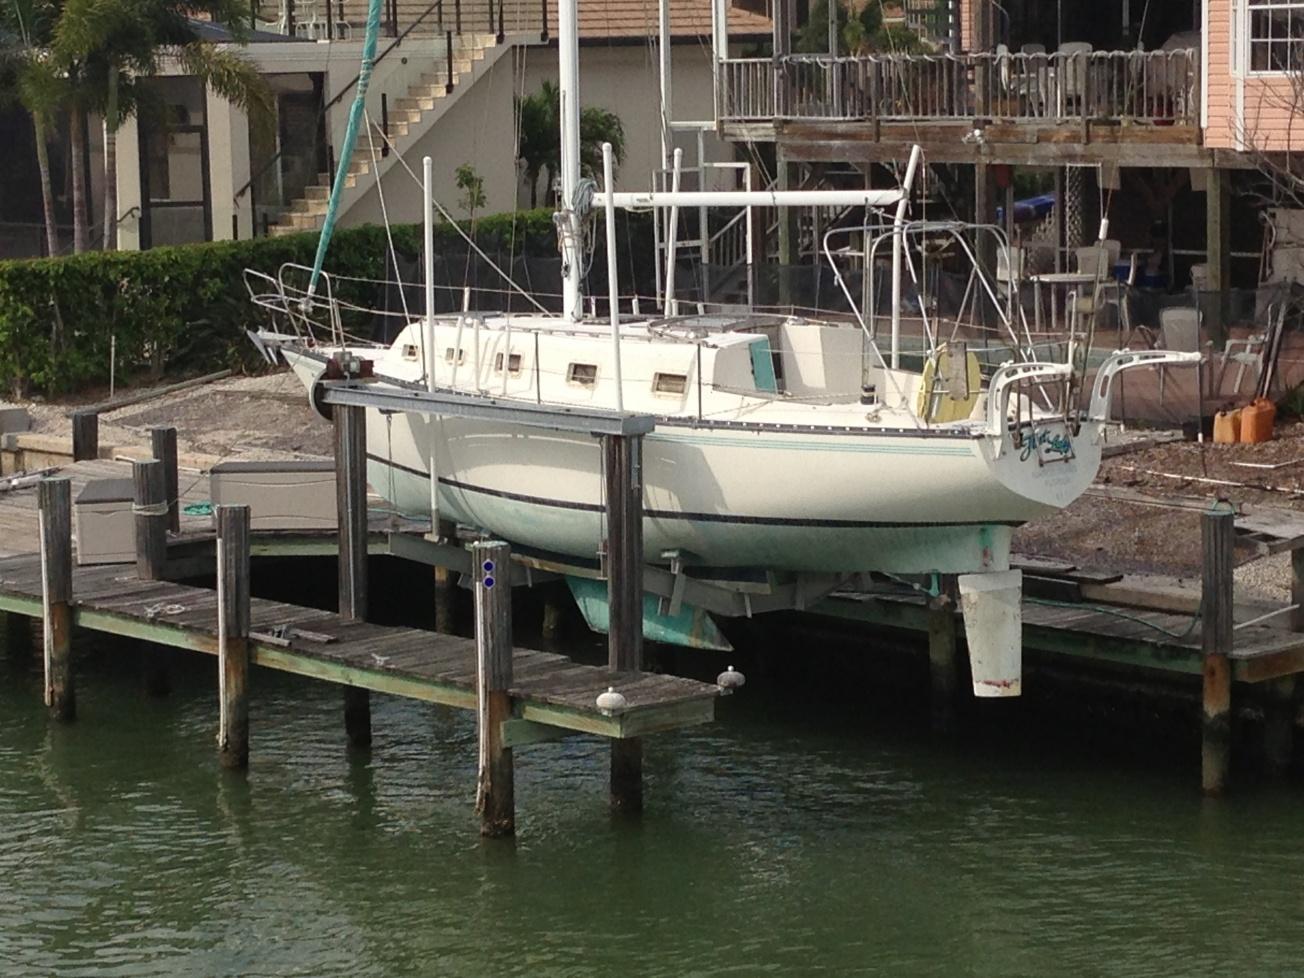 Click image for larger version  Name:boat dodger 002.jpg Views:71 Size:445.9 KB ID:59002